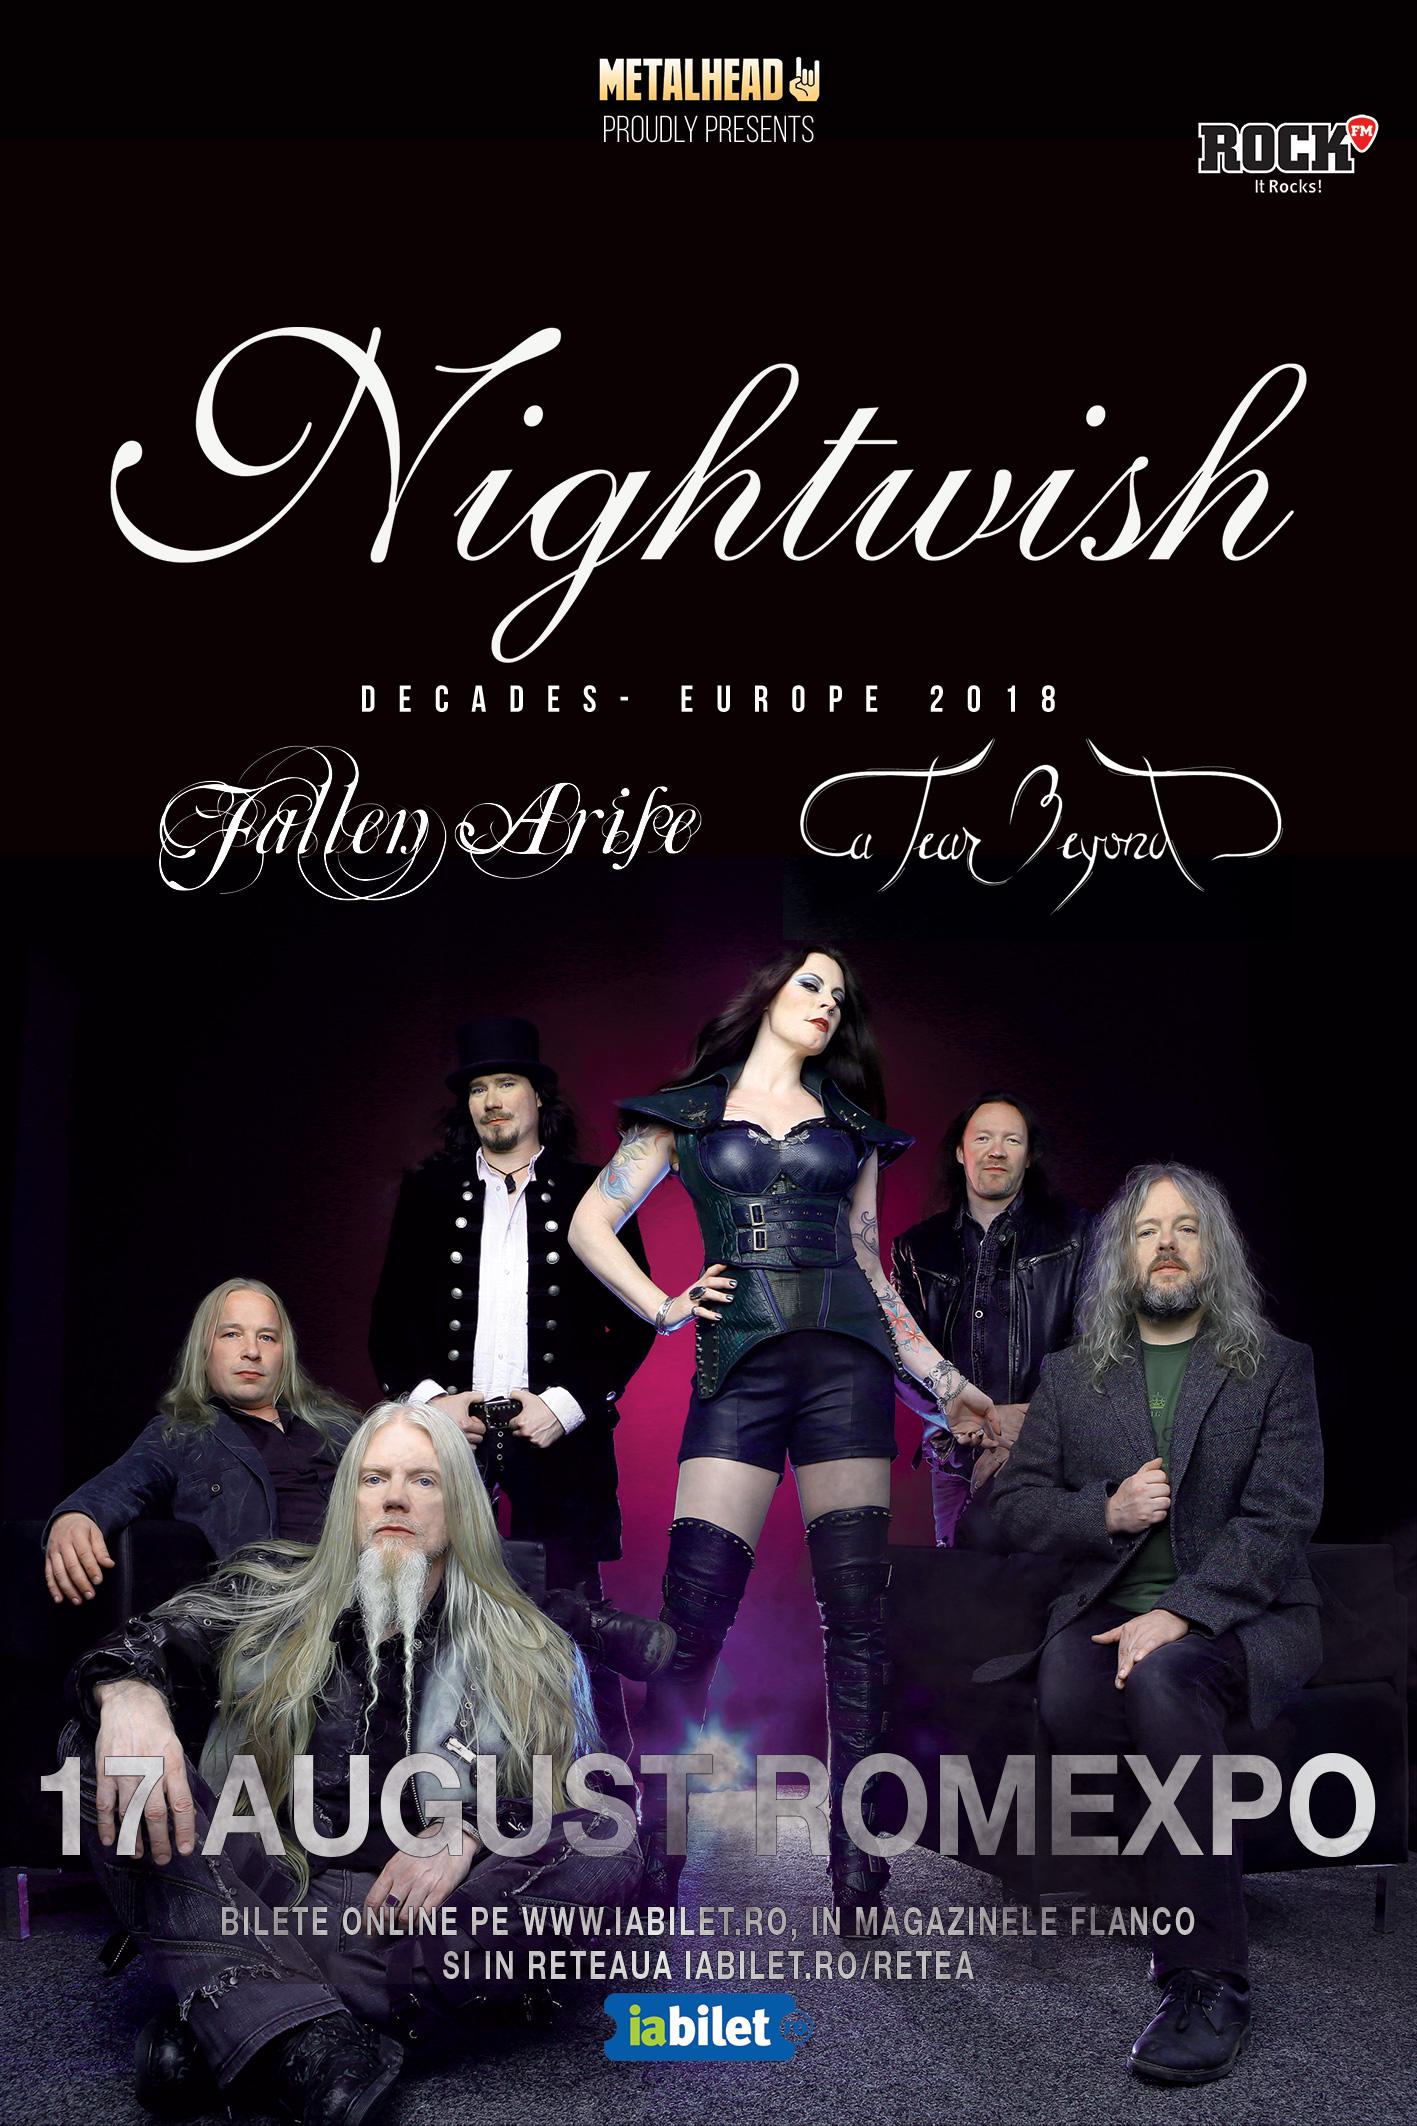 {focus_keyword} Fallen Arise și A Tear Beyond vor deschide concertul Nightwish 3071e1cb 5423 4ac6 a839 e7fb83497bb4